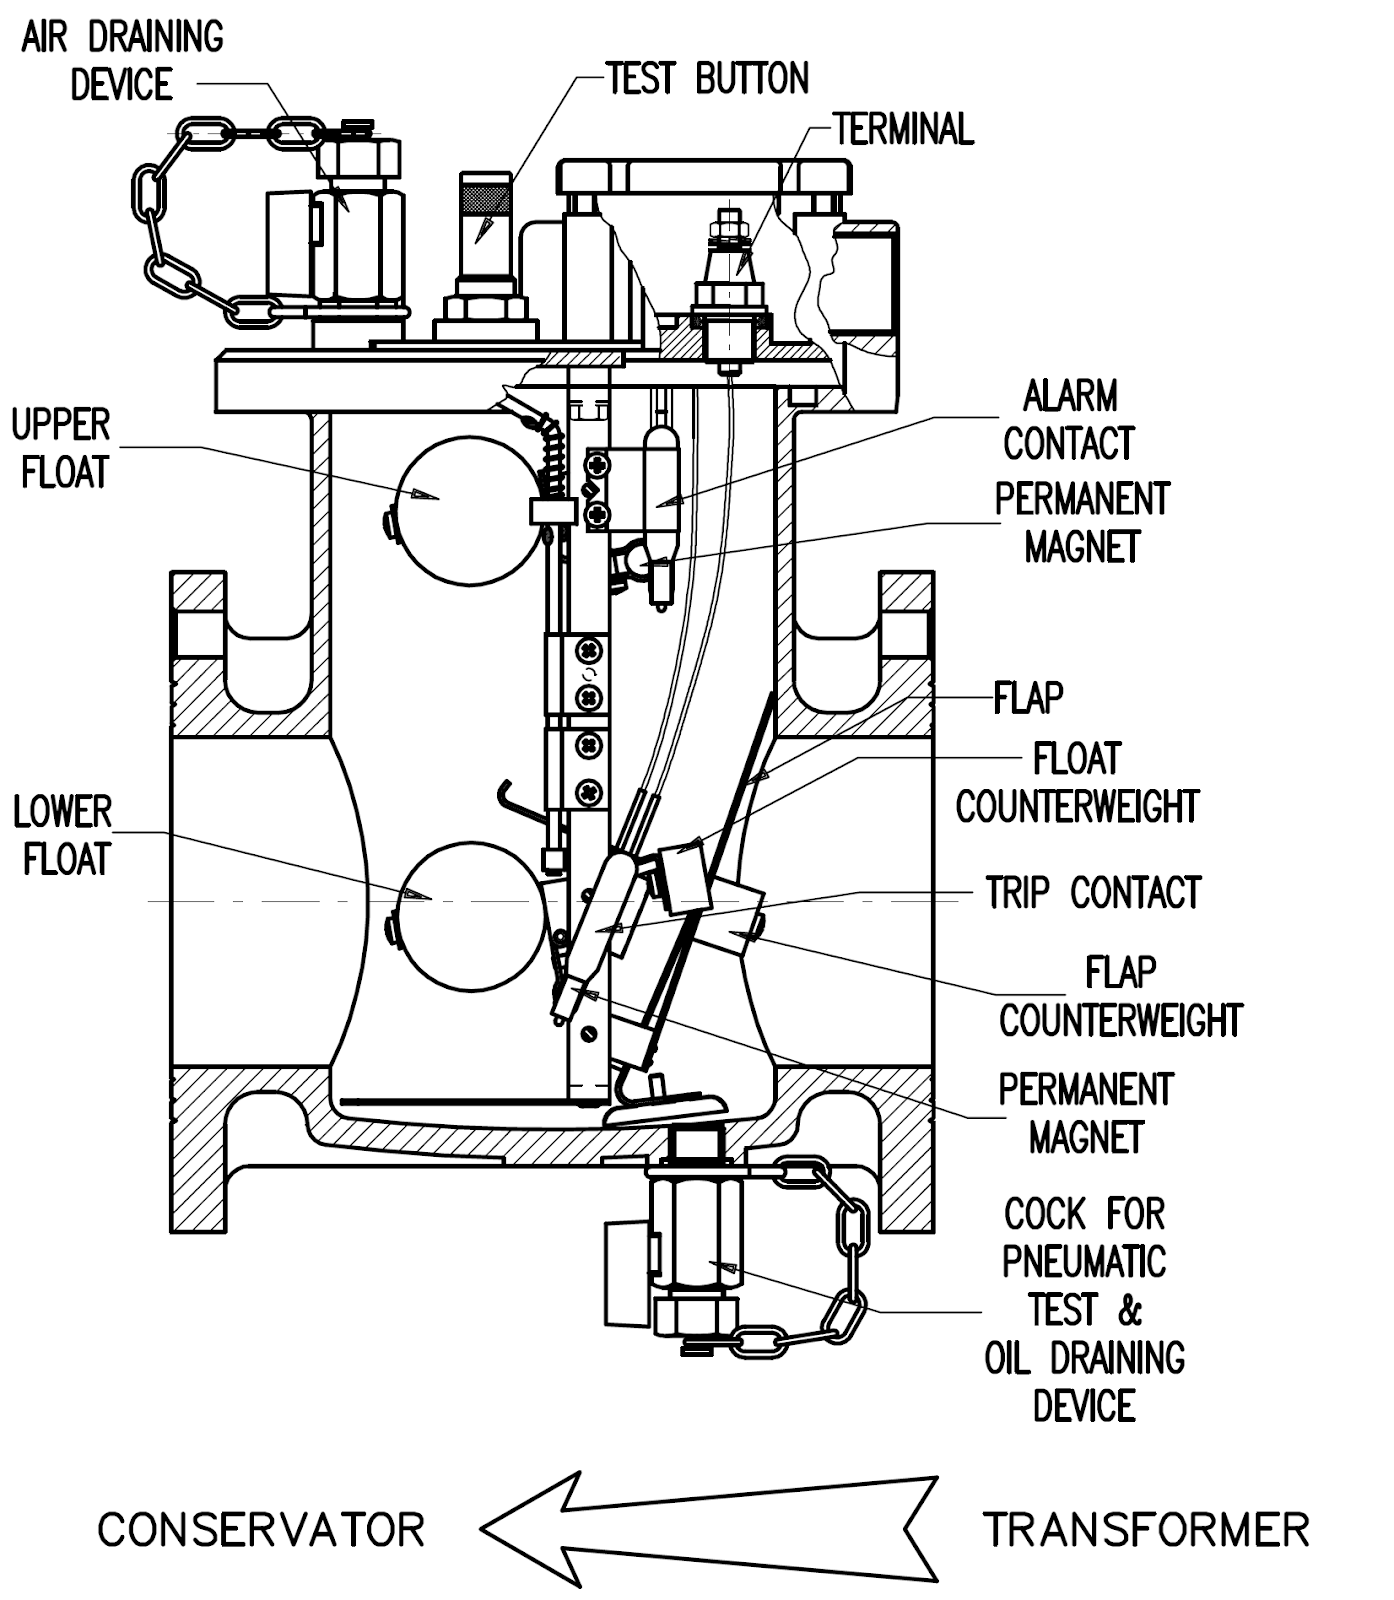 Buchholz Relay Buchholz relay Principle of operation